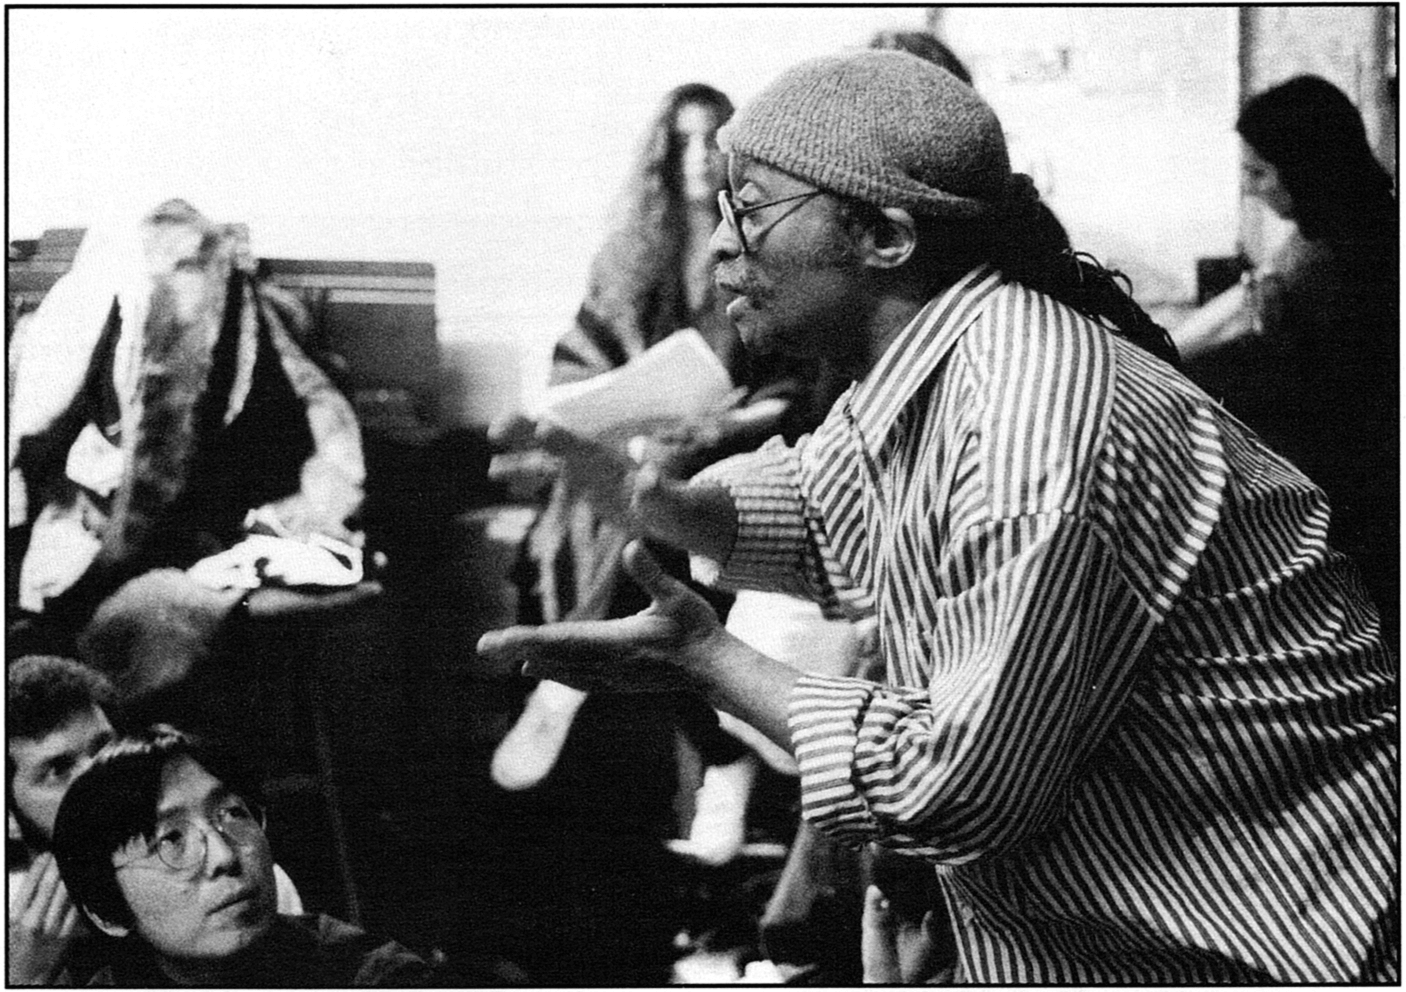 Cecil Taylor & Hiroaki Honshuku